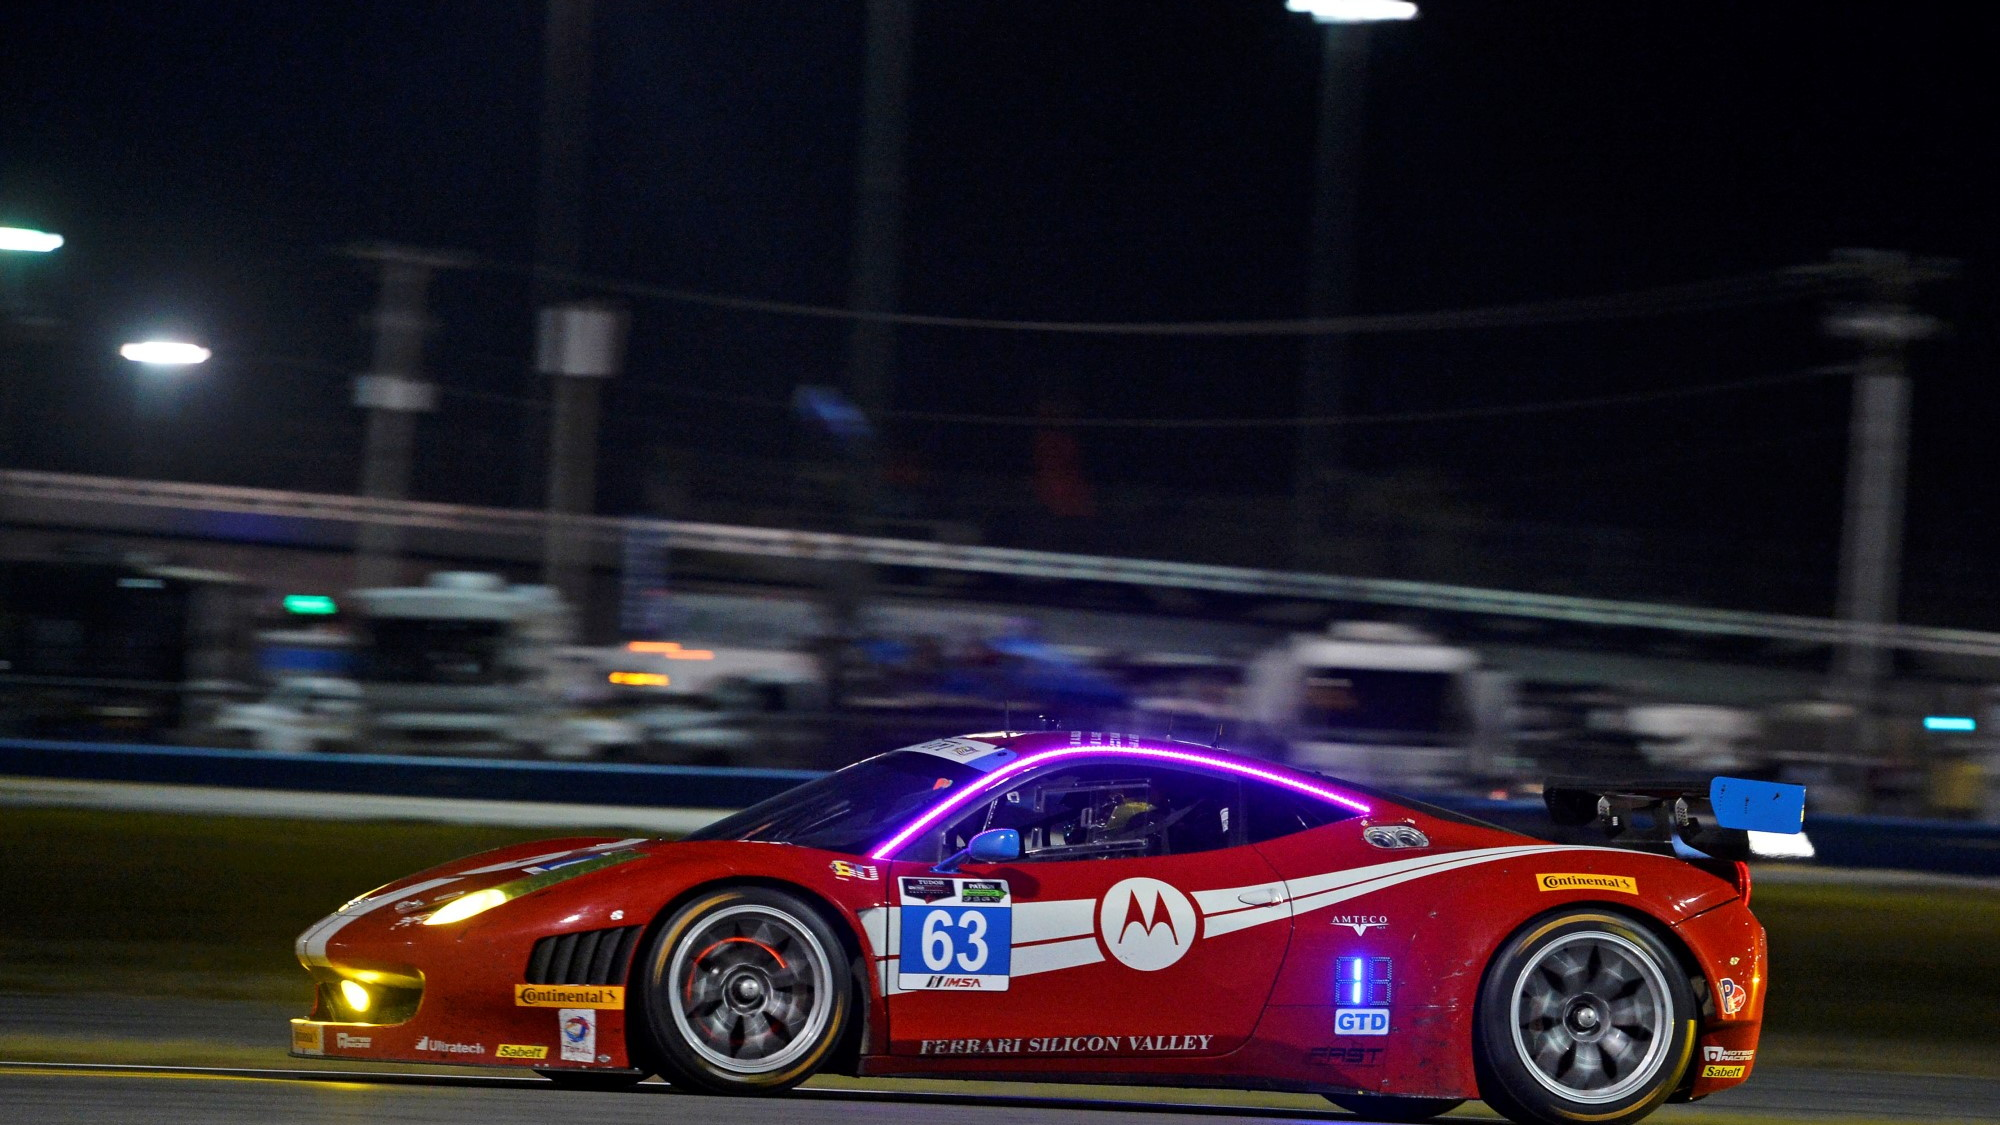 Ferrari at the 2014 Daytona 24 Hours